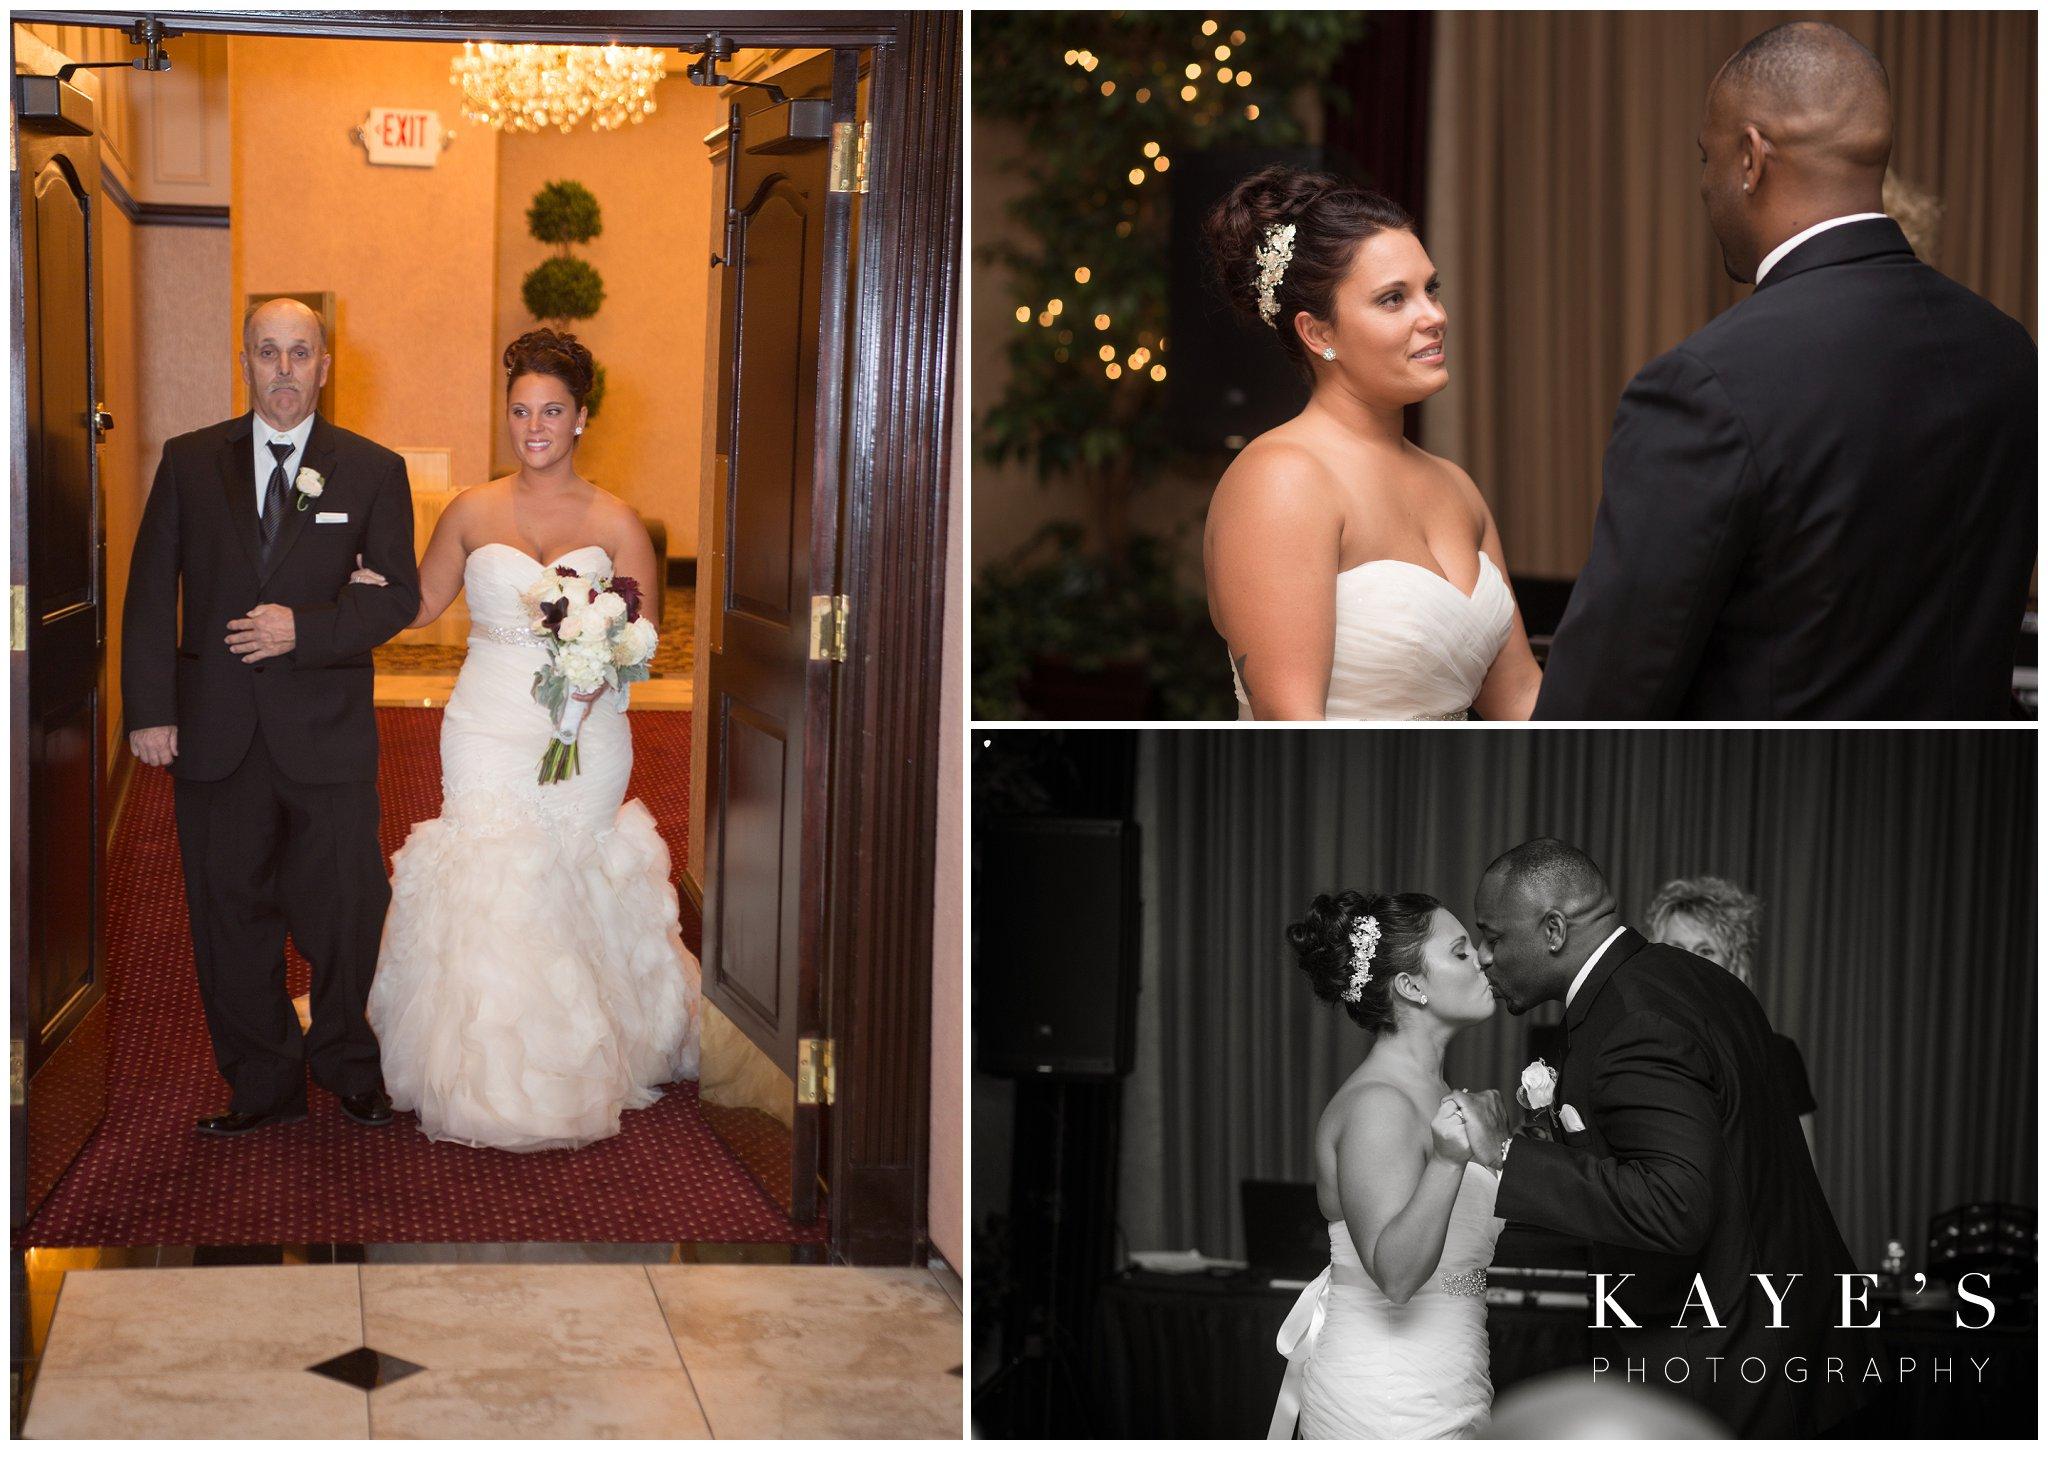 Kayes Photography- howell-michigan-wedding-photographer_0653.jpg